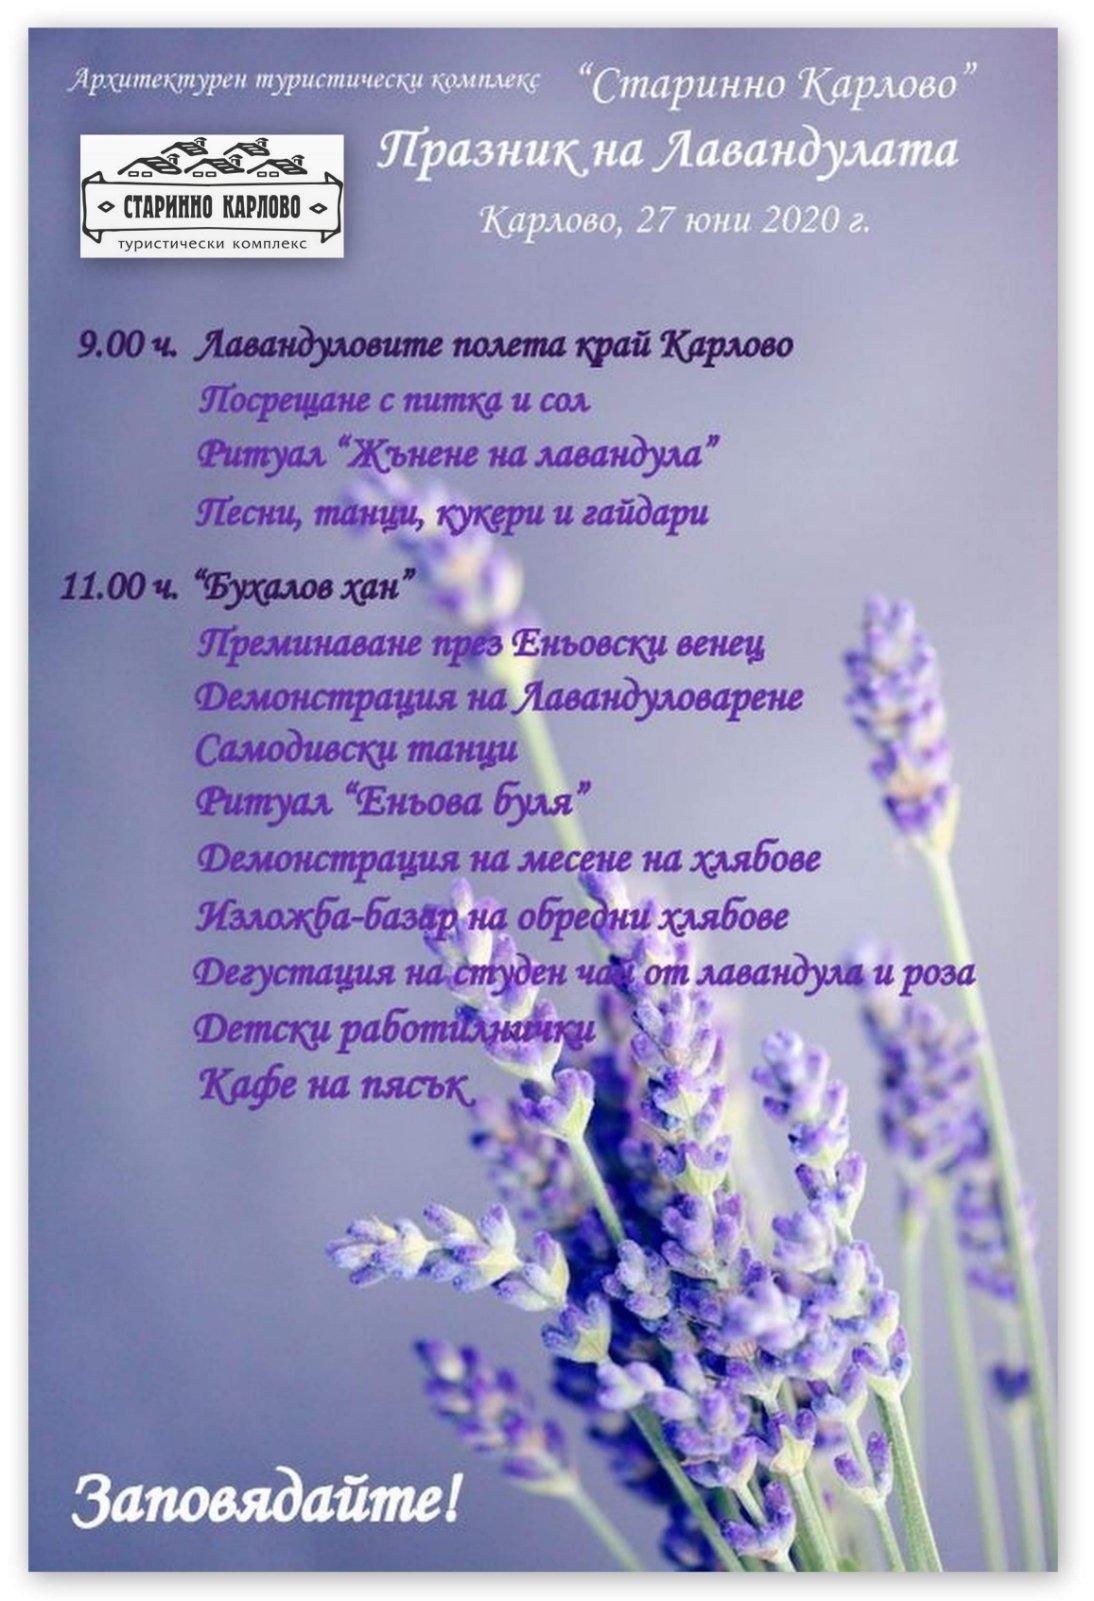 viber_image_2020-06-10_14-23-01